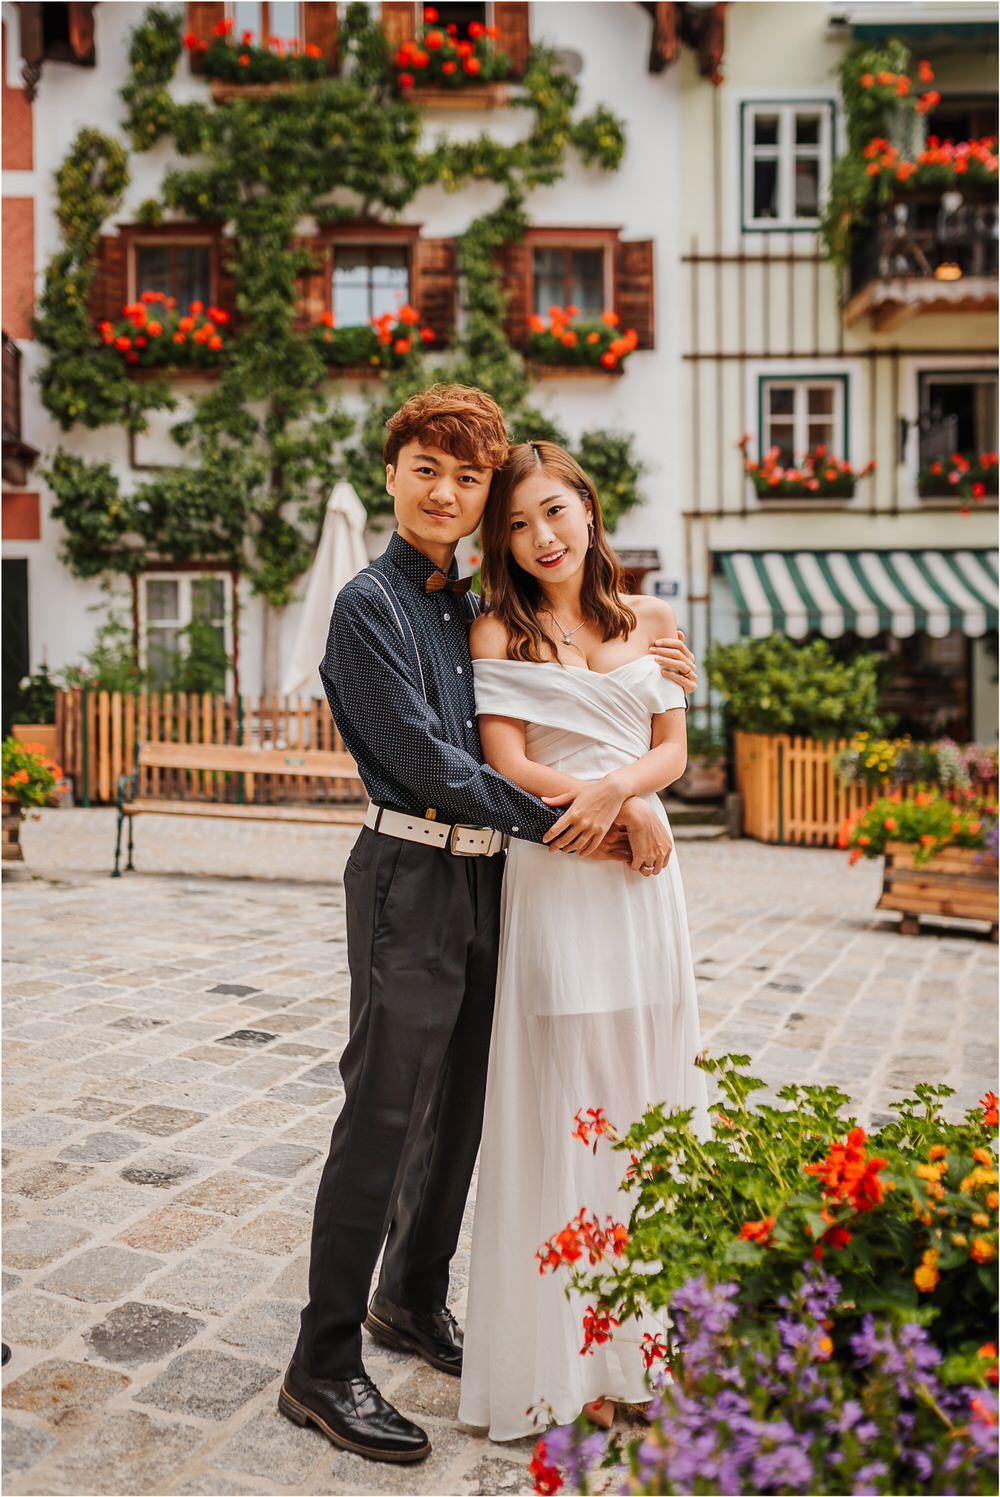 hallstatt austria wedding engagement photographer asian proposal surprise photography recommended nature professional 0014.jpg